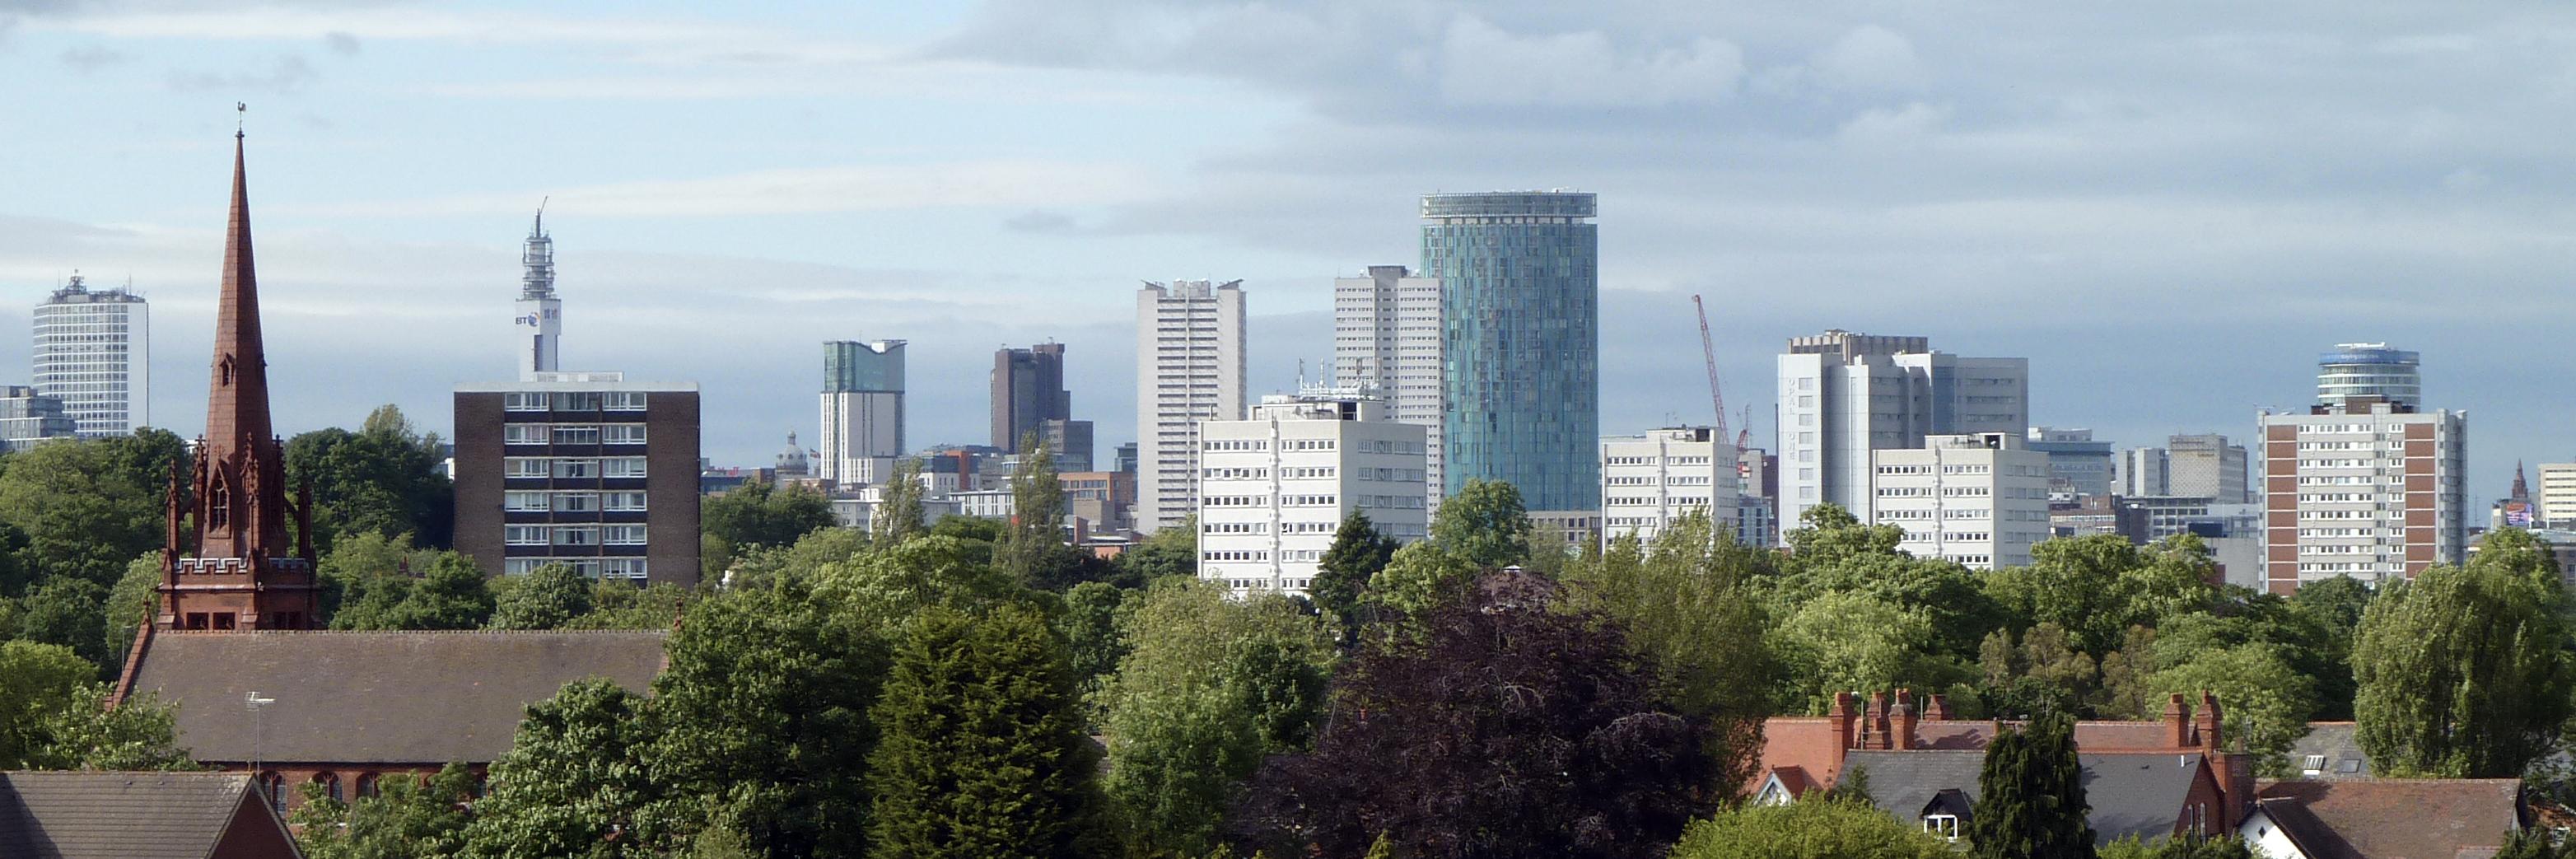 File:Birmingham-Skyline-from-Edgbaston-crop.jpg - Wikimedia Commons